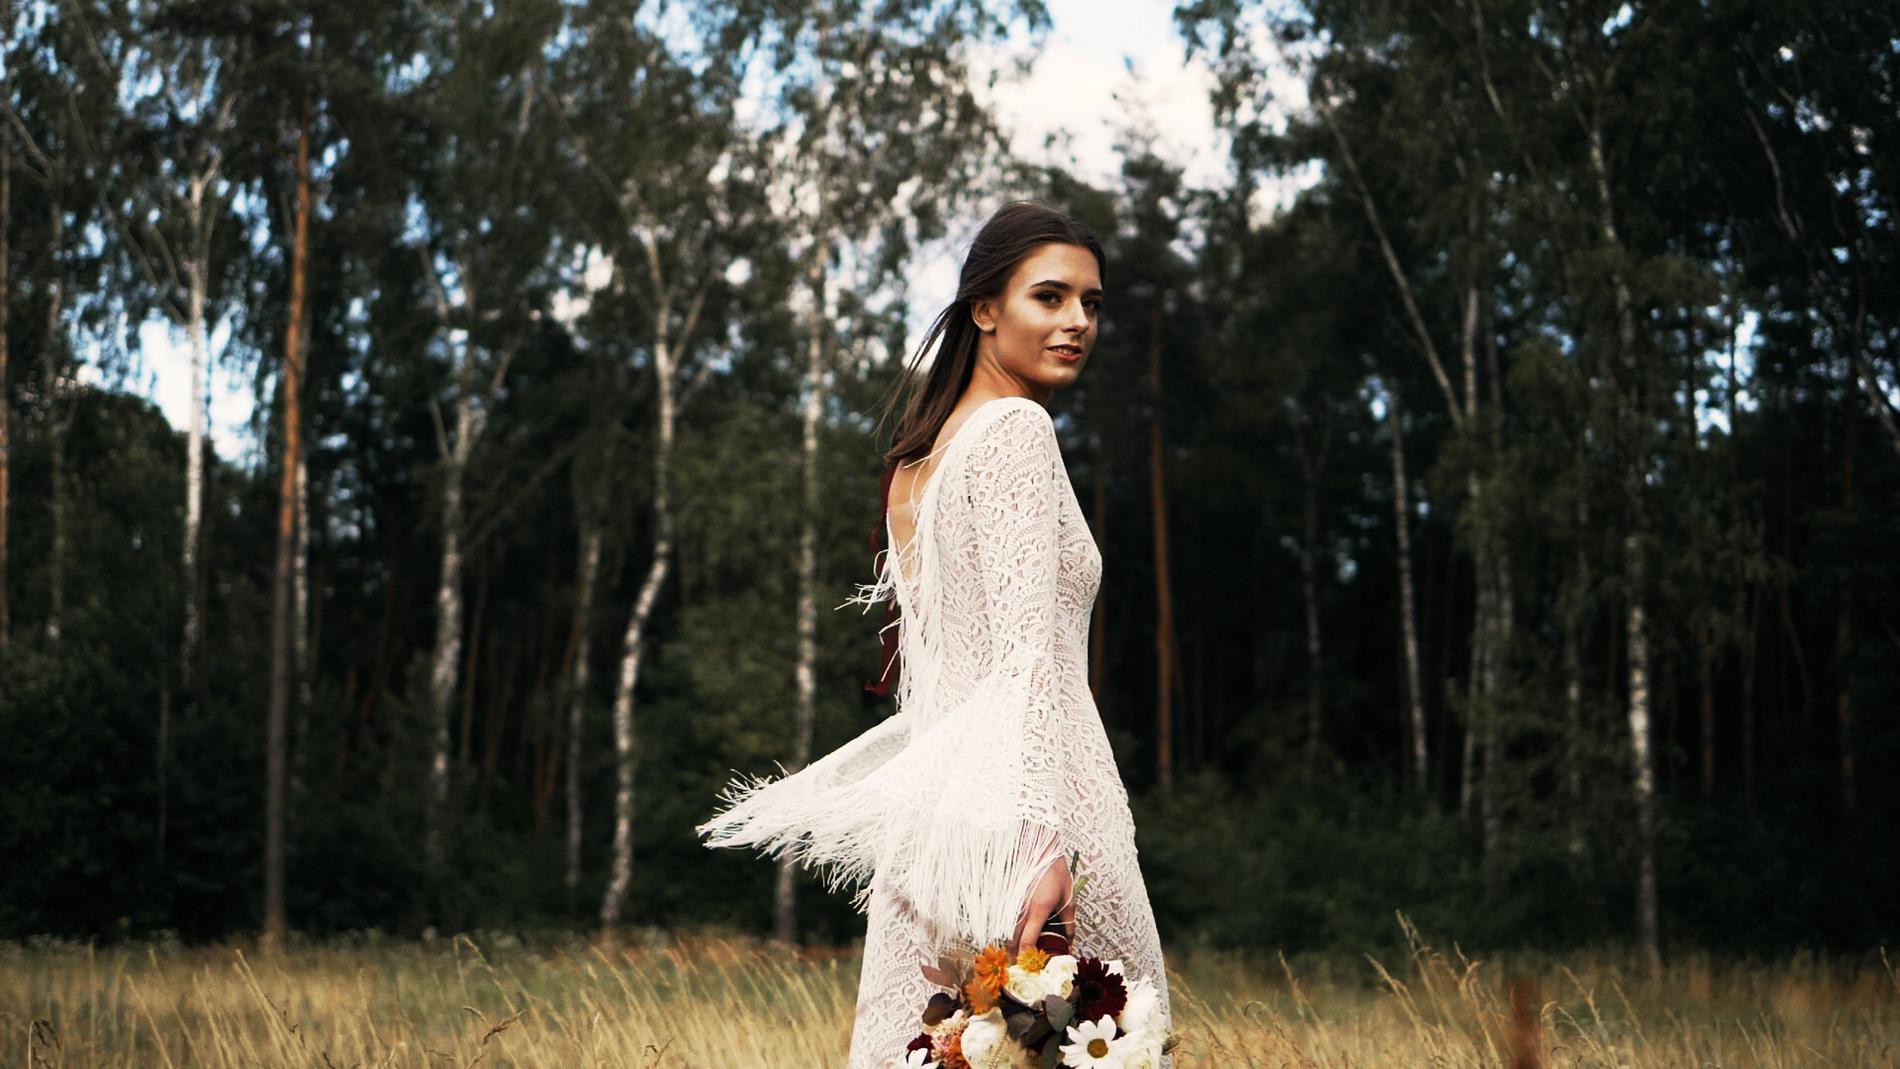 wedding_editorial_art_film_portrait_videographer_sesja_slubna_stylizowana_boho_filmowca_teledysk_slubny 02 (9).jpg